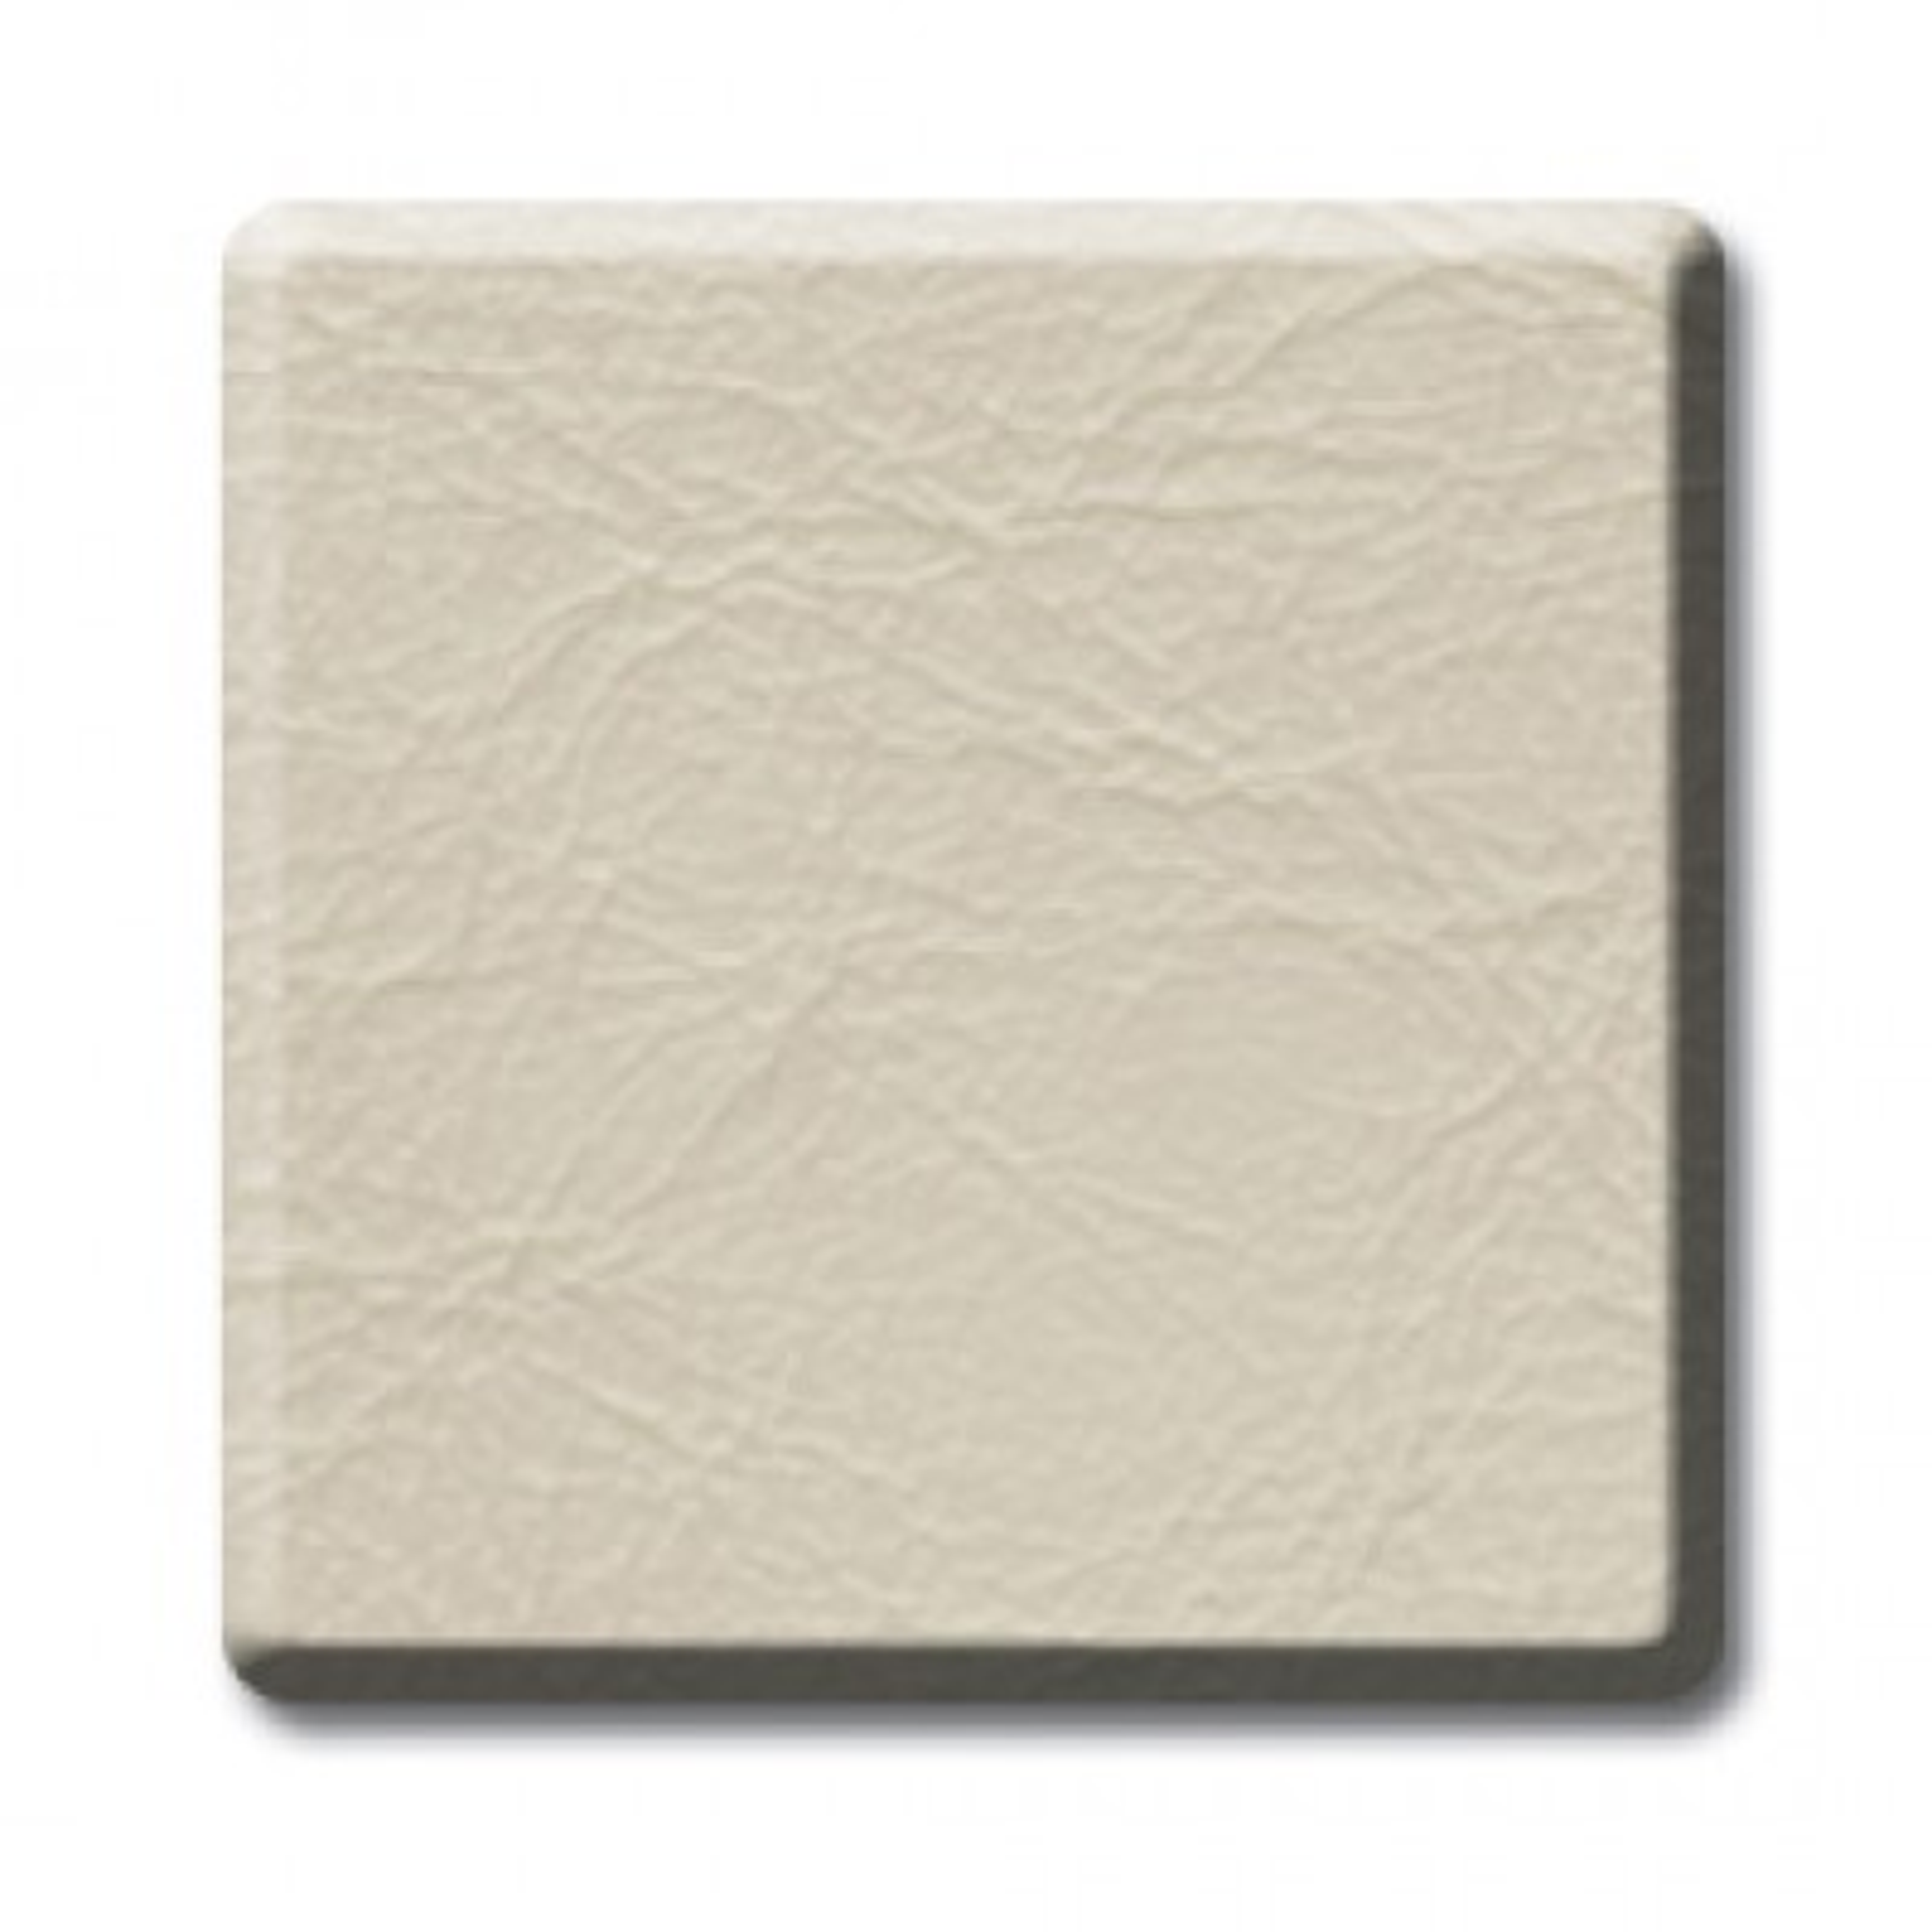 242 670 Robbins Crush Grain Vinyl Convertible Top White